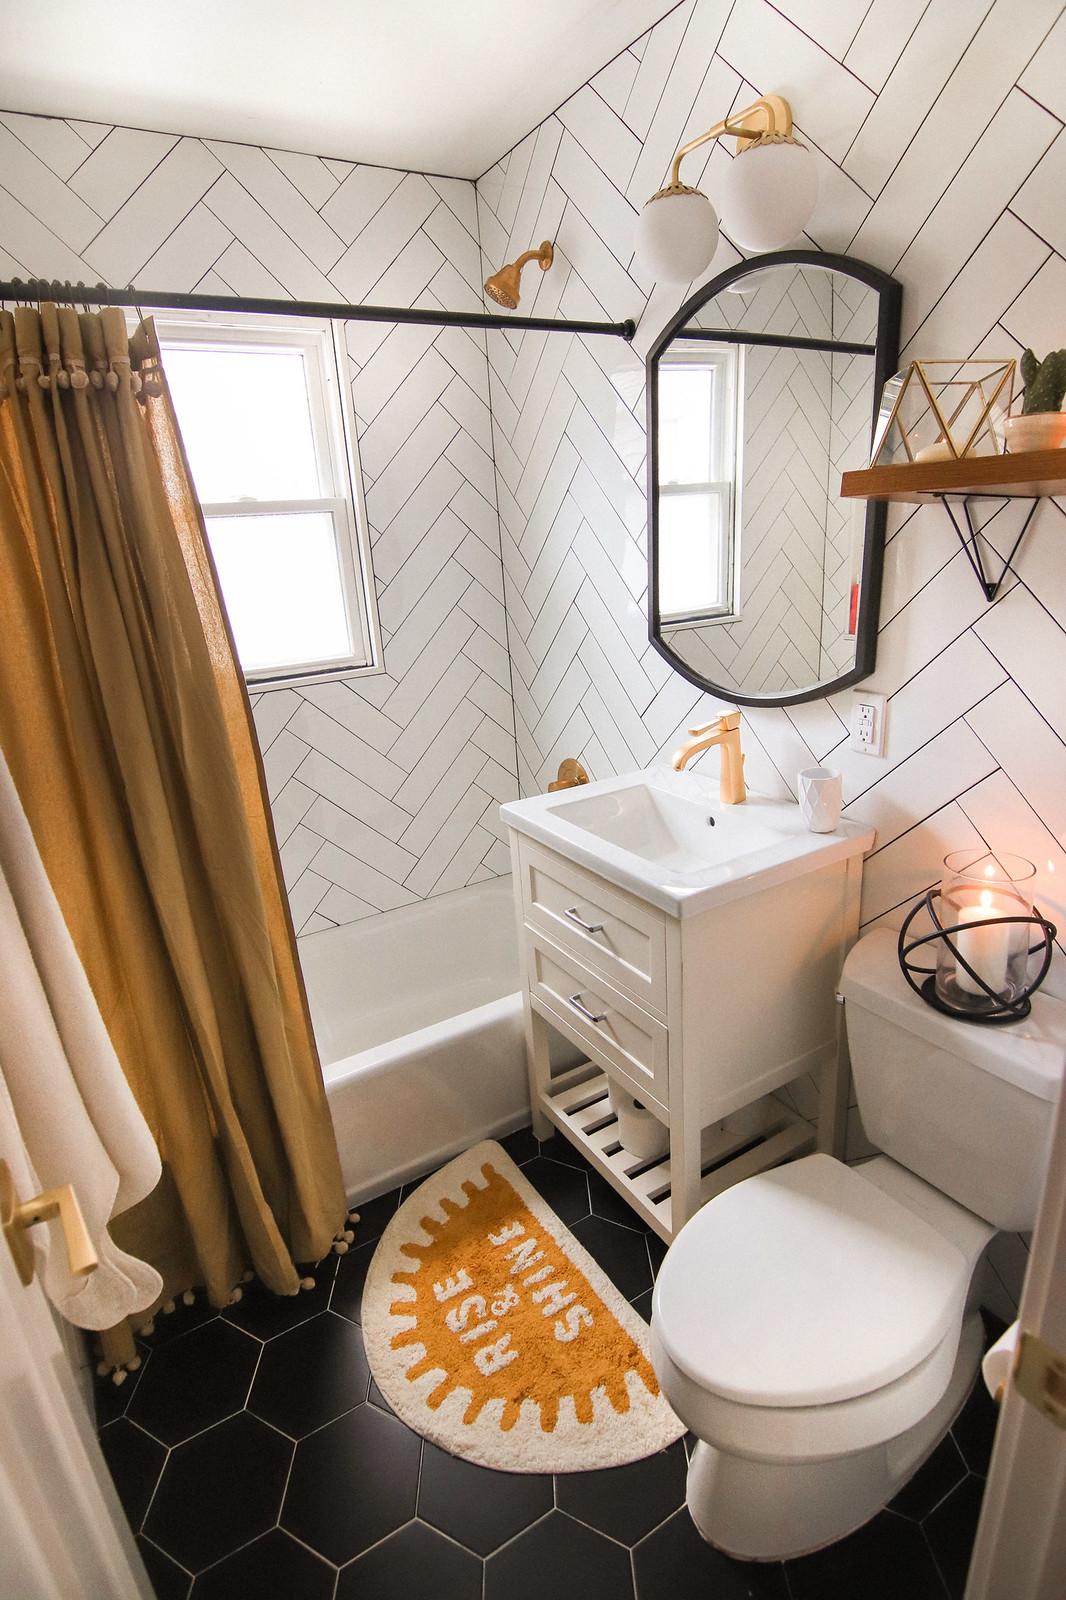 White Subway Tile Black Grout | Mustard Yellow Bathroom Accents | Large Black Hexagon Floor Tile